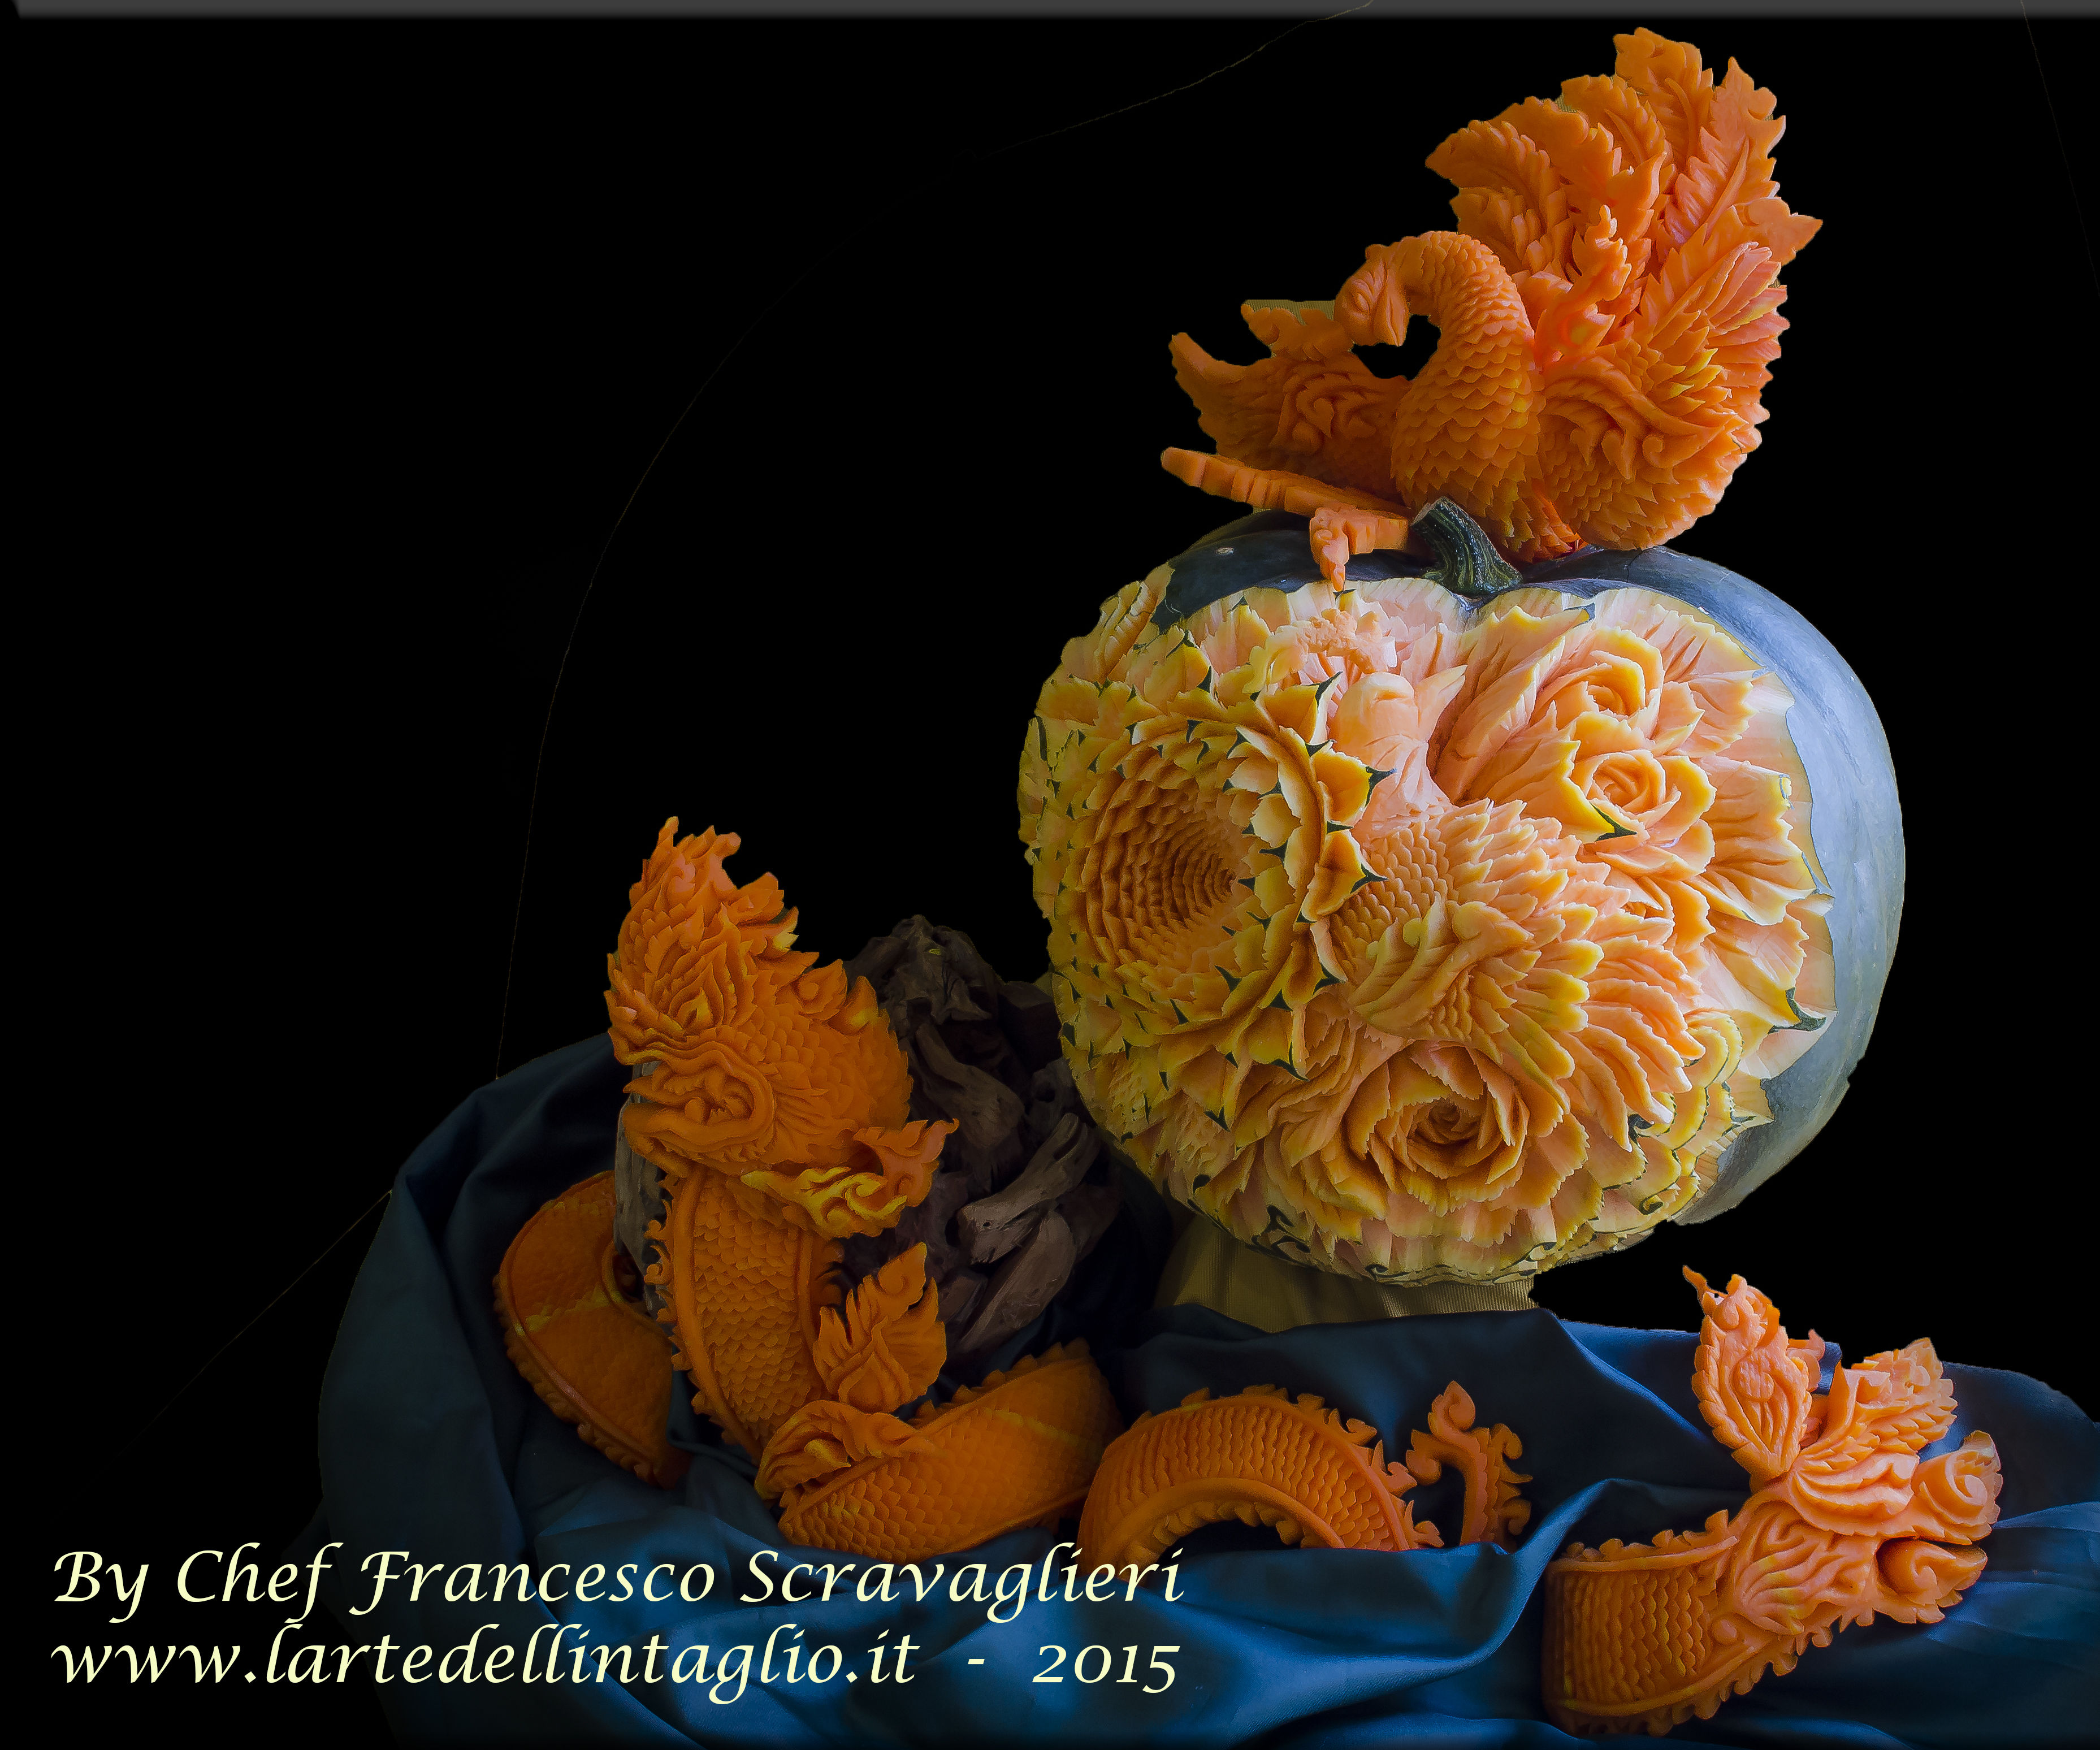 The carving pumpkin